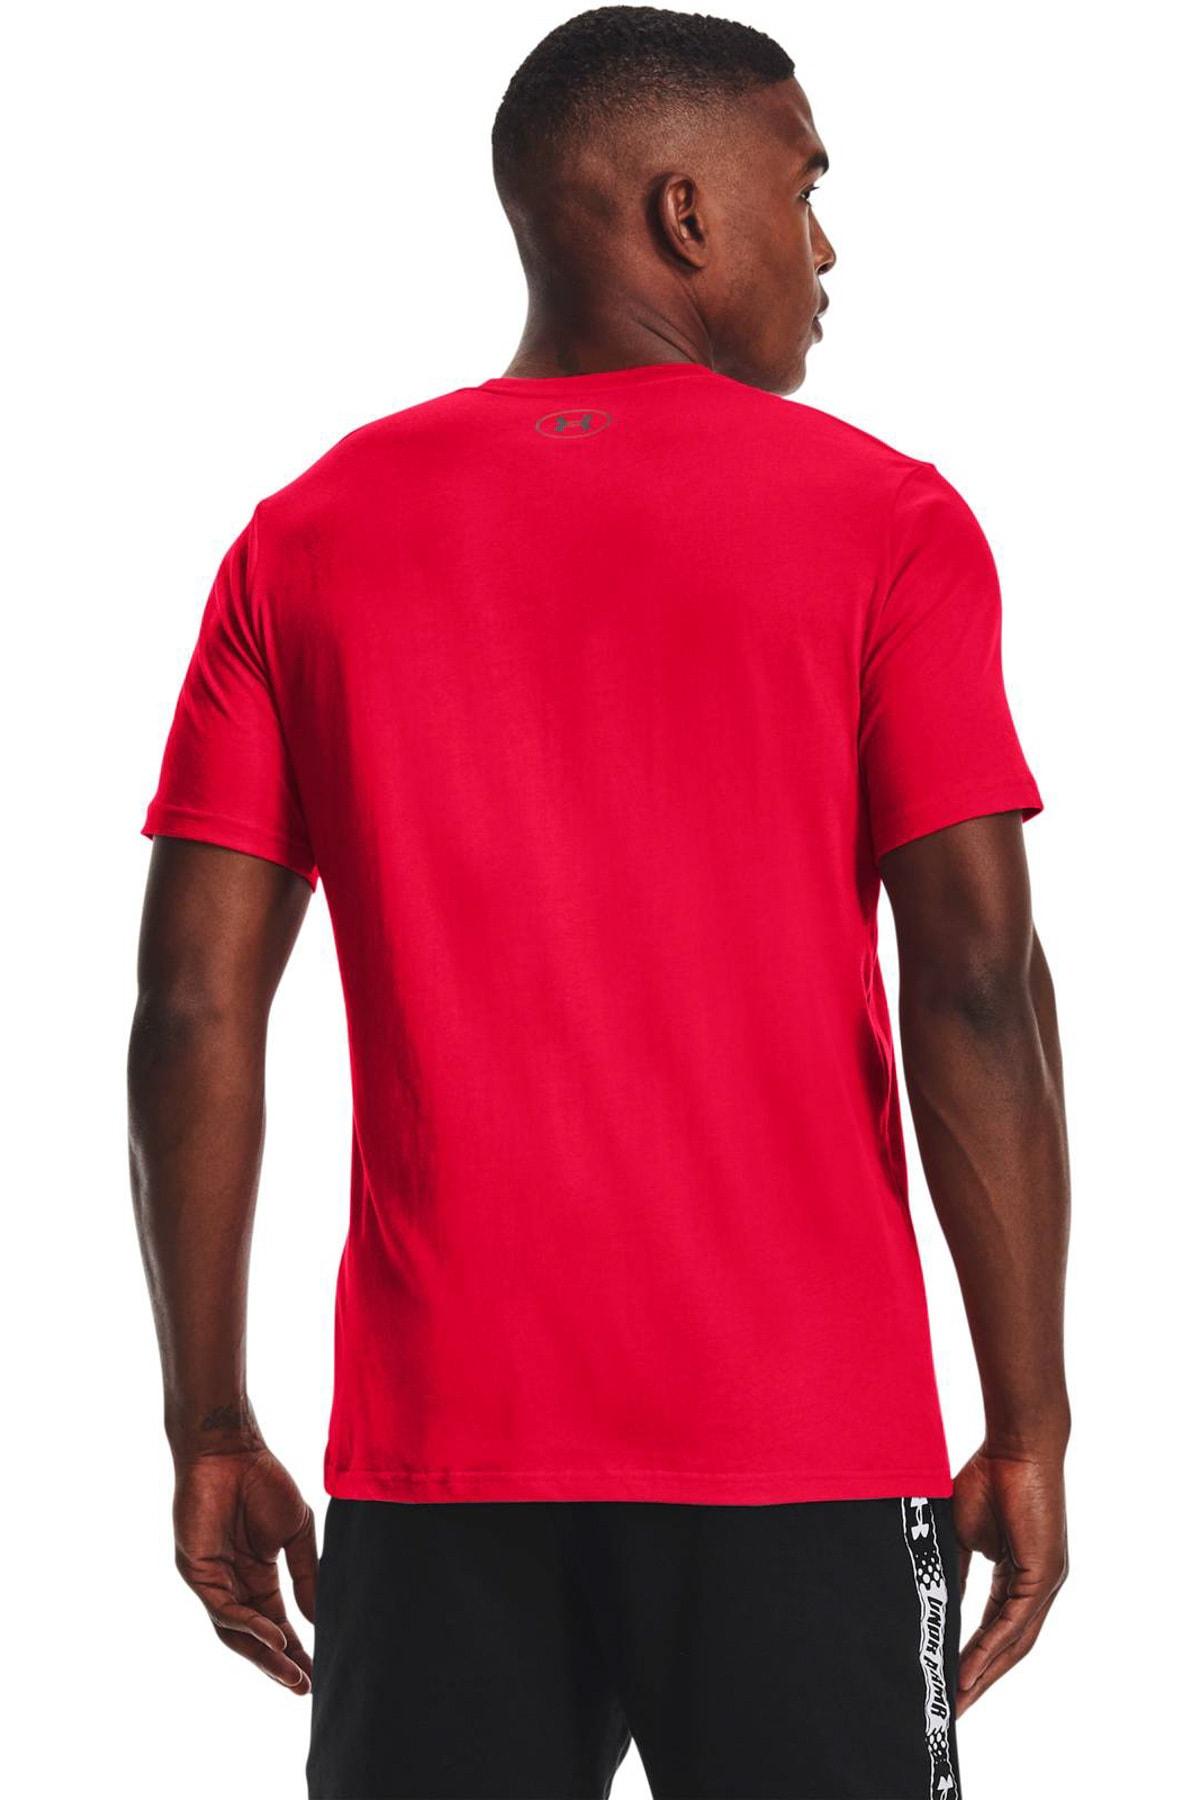 Under Armour Erkek Spor T-Shirt - UA HOOPS ICON TEE - 1361920-600 2